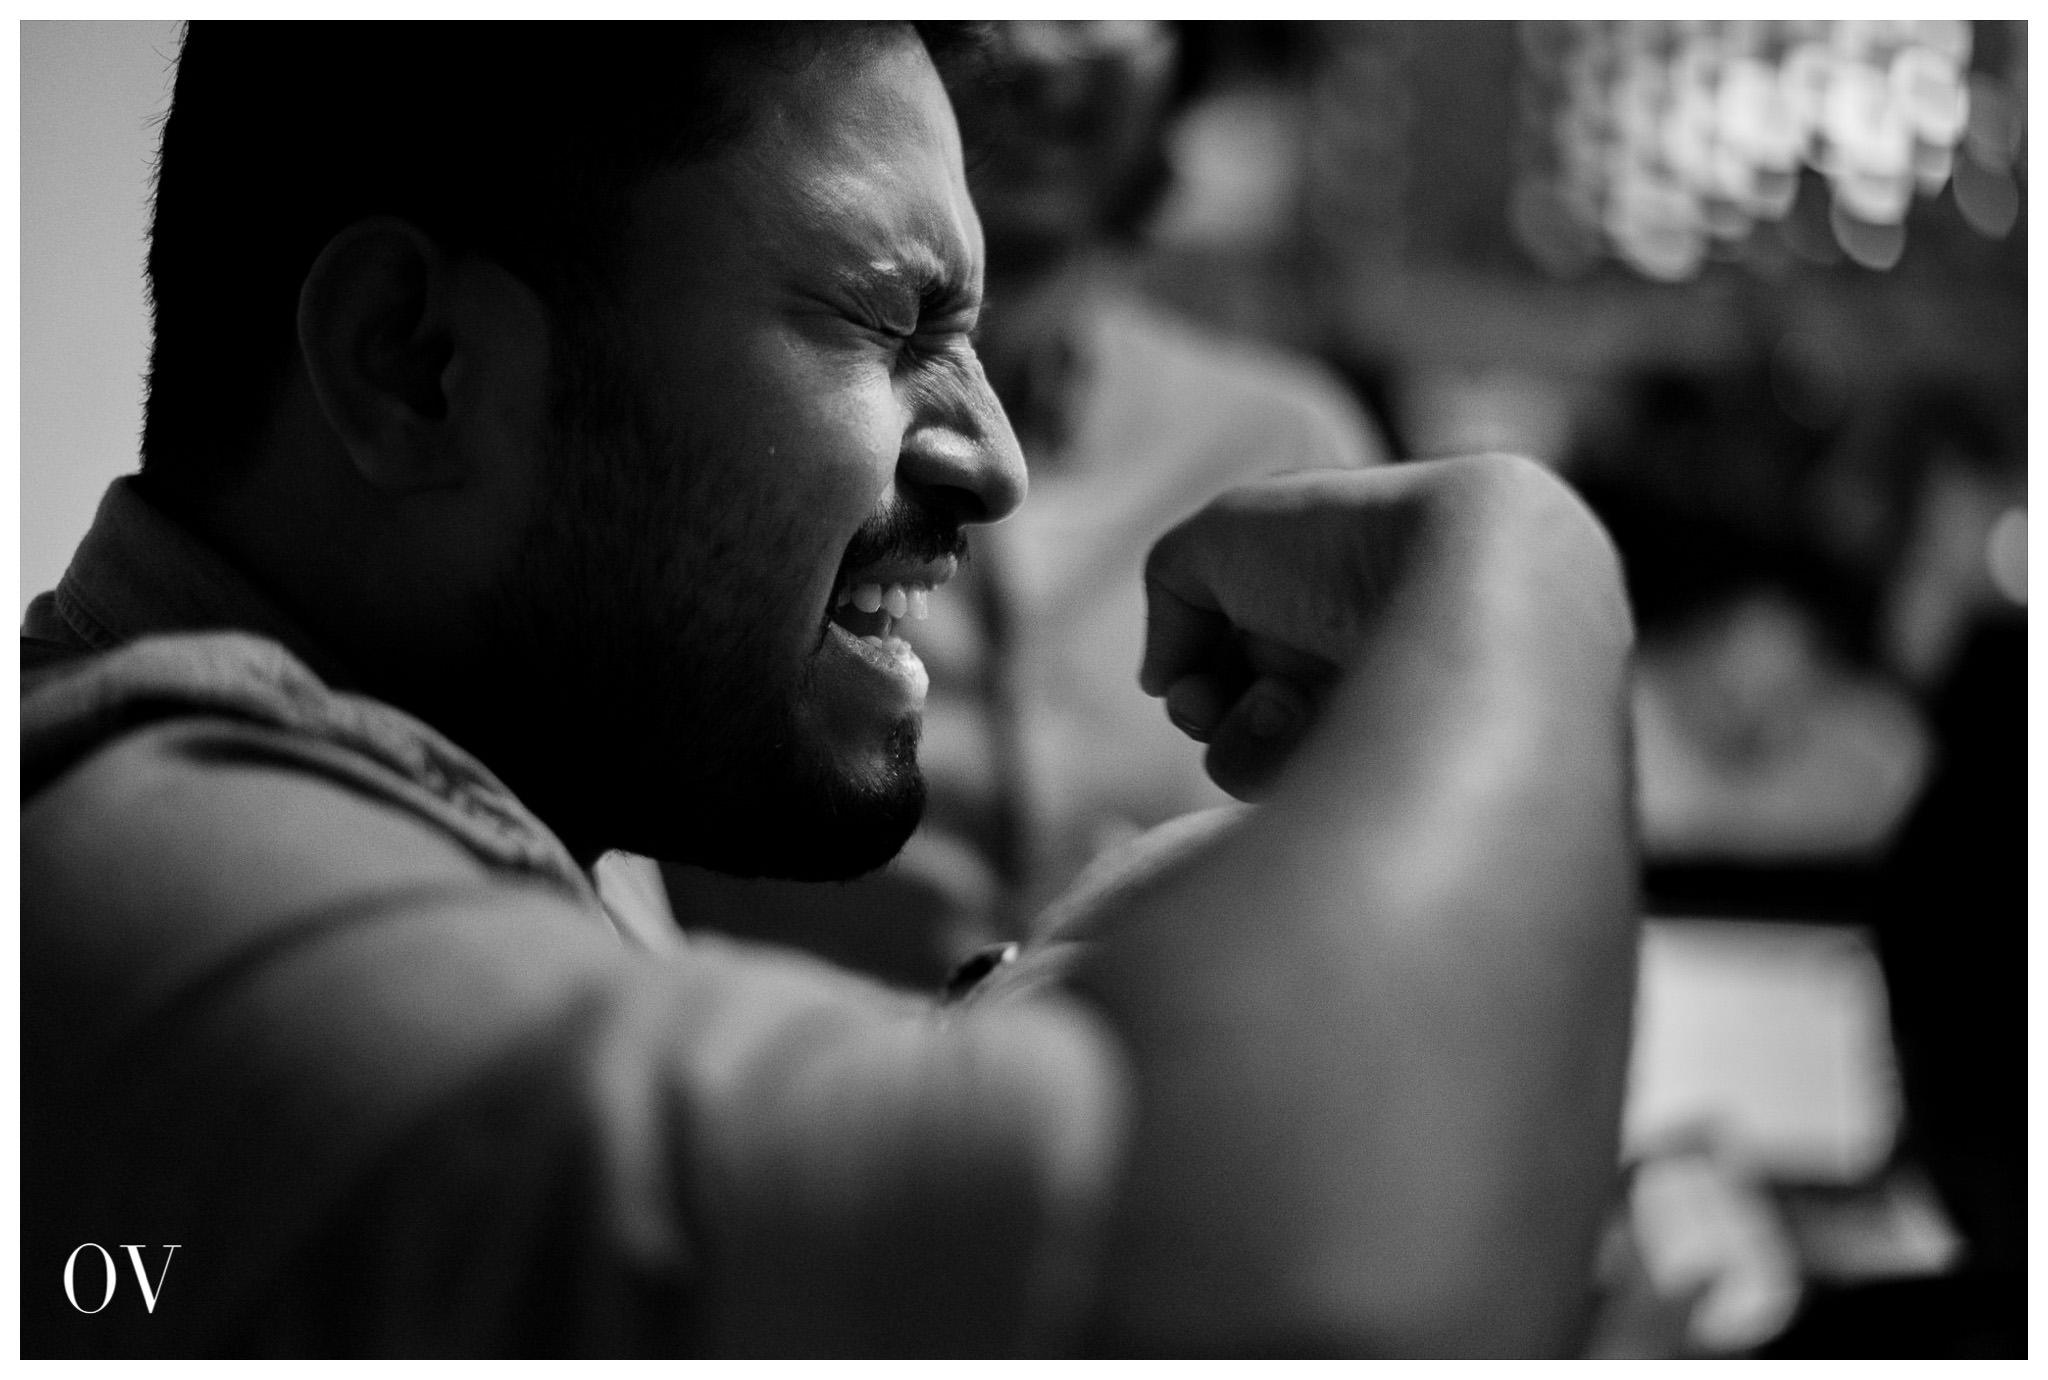 Abish Mathew-Son of Abish-Behind the scenes-28.JPG